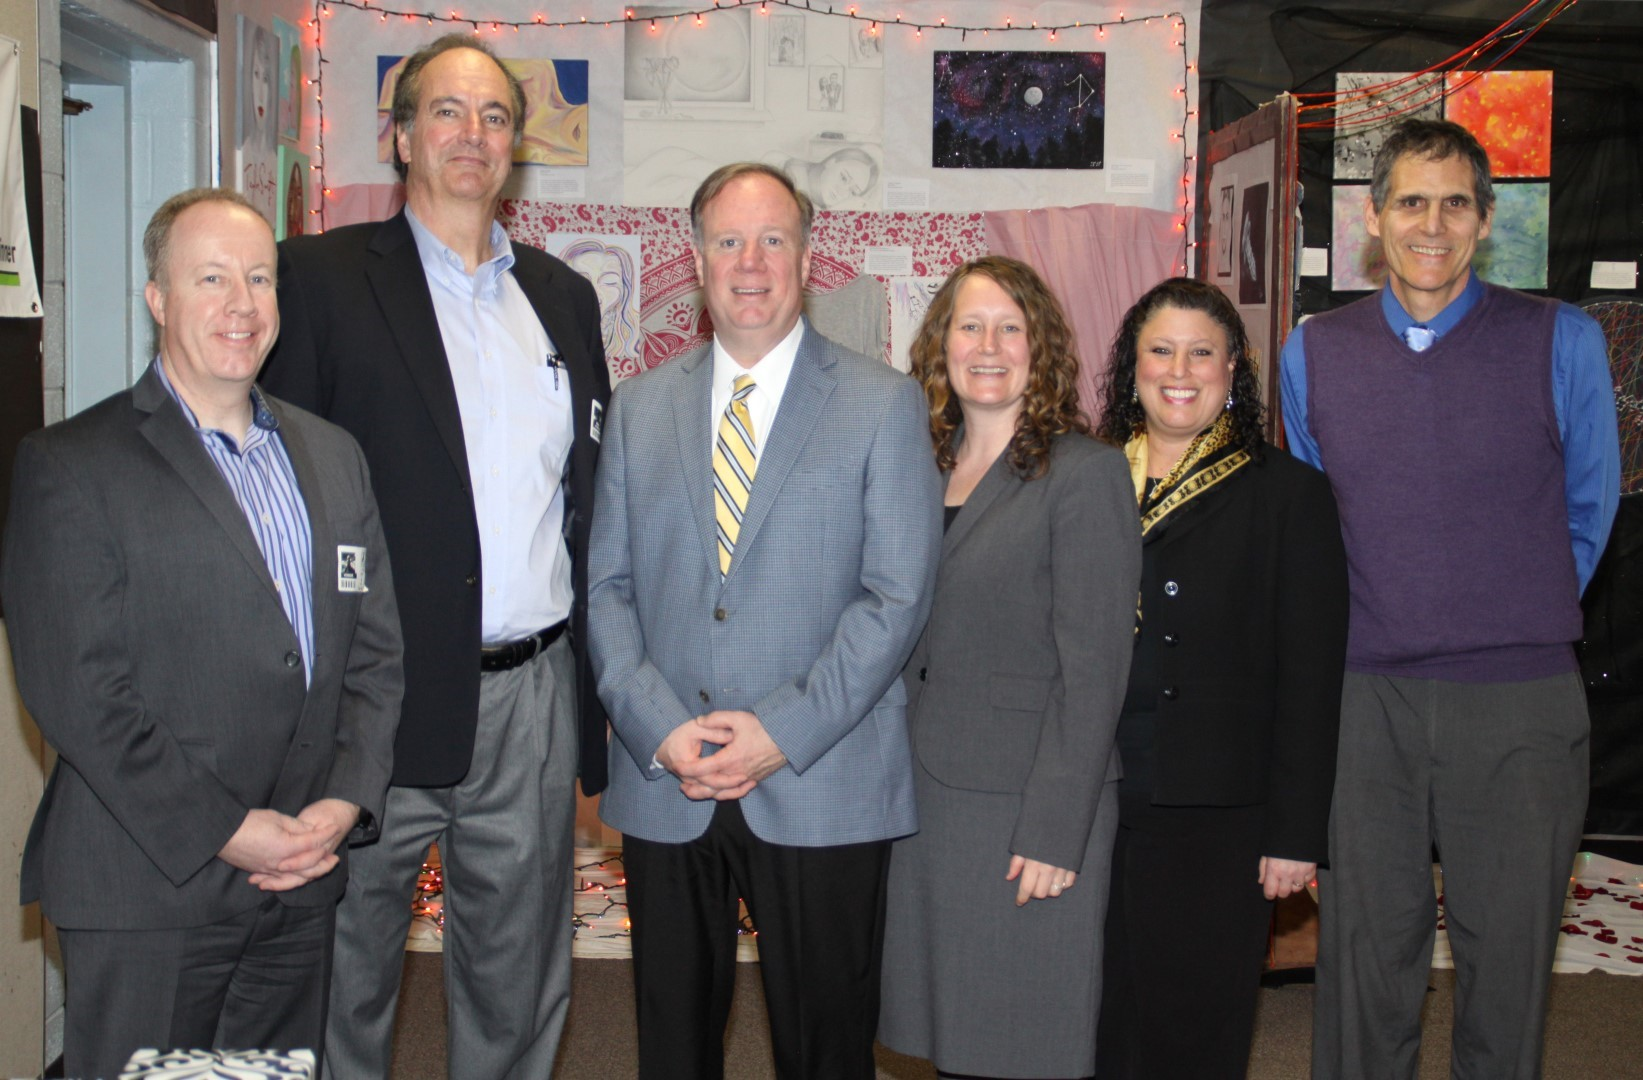 Toshiba RepsPaul Hickey & Paul Fitzpatrick w Dr. James, Dr. Celentano, Mrs. Boritz, & Mr. Kurtz